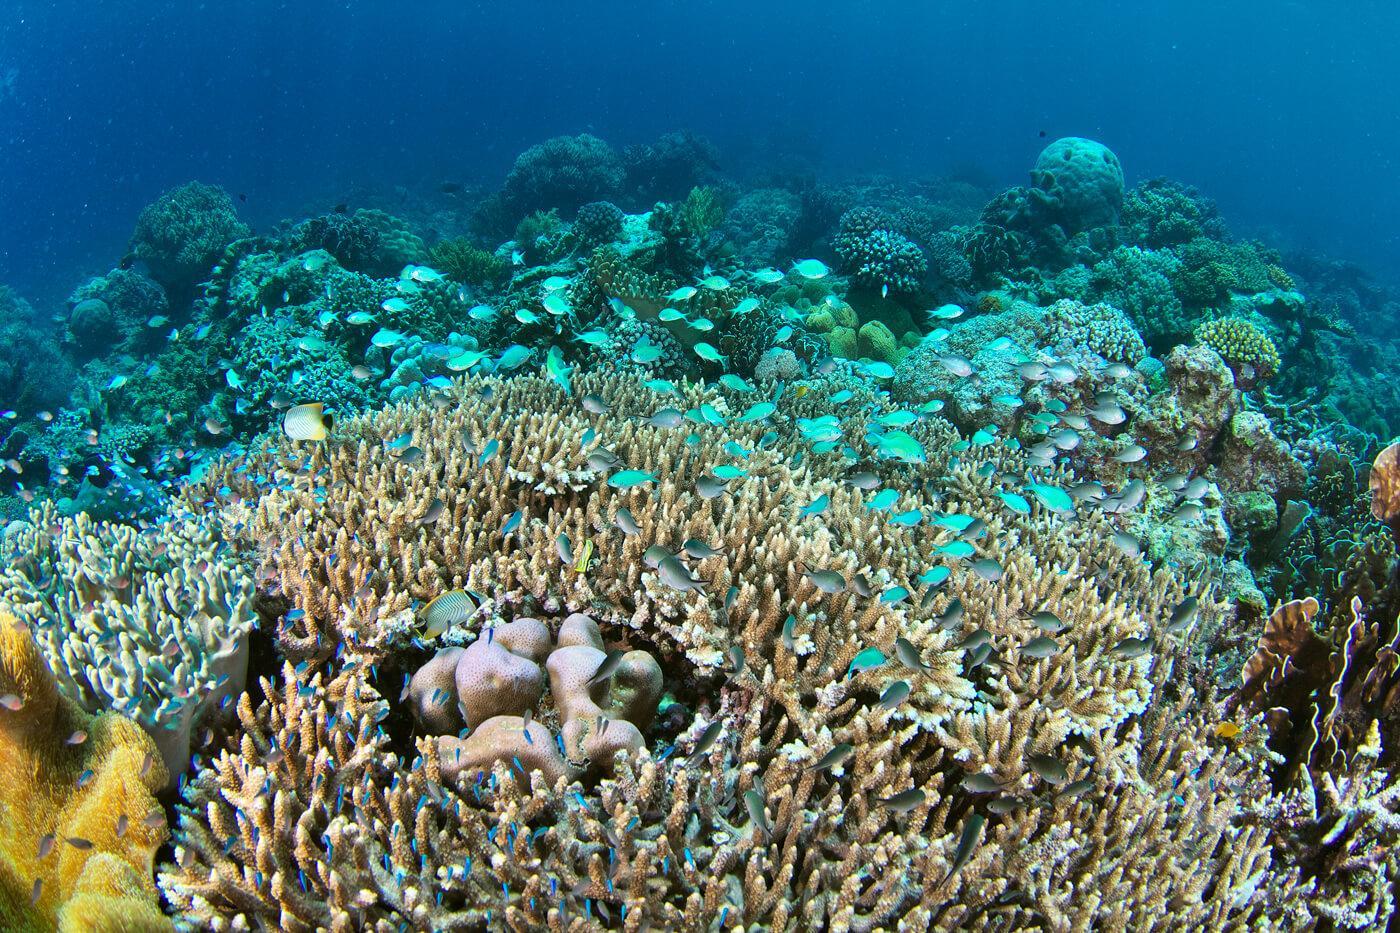 Explore dazzling coral reefs in Raja Ampat, Indonesia. © Keoki Stender